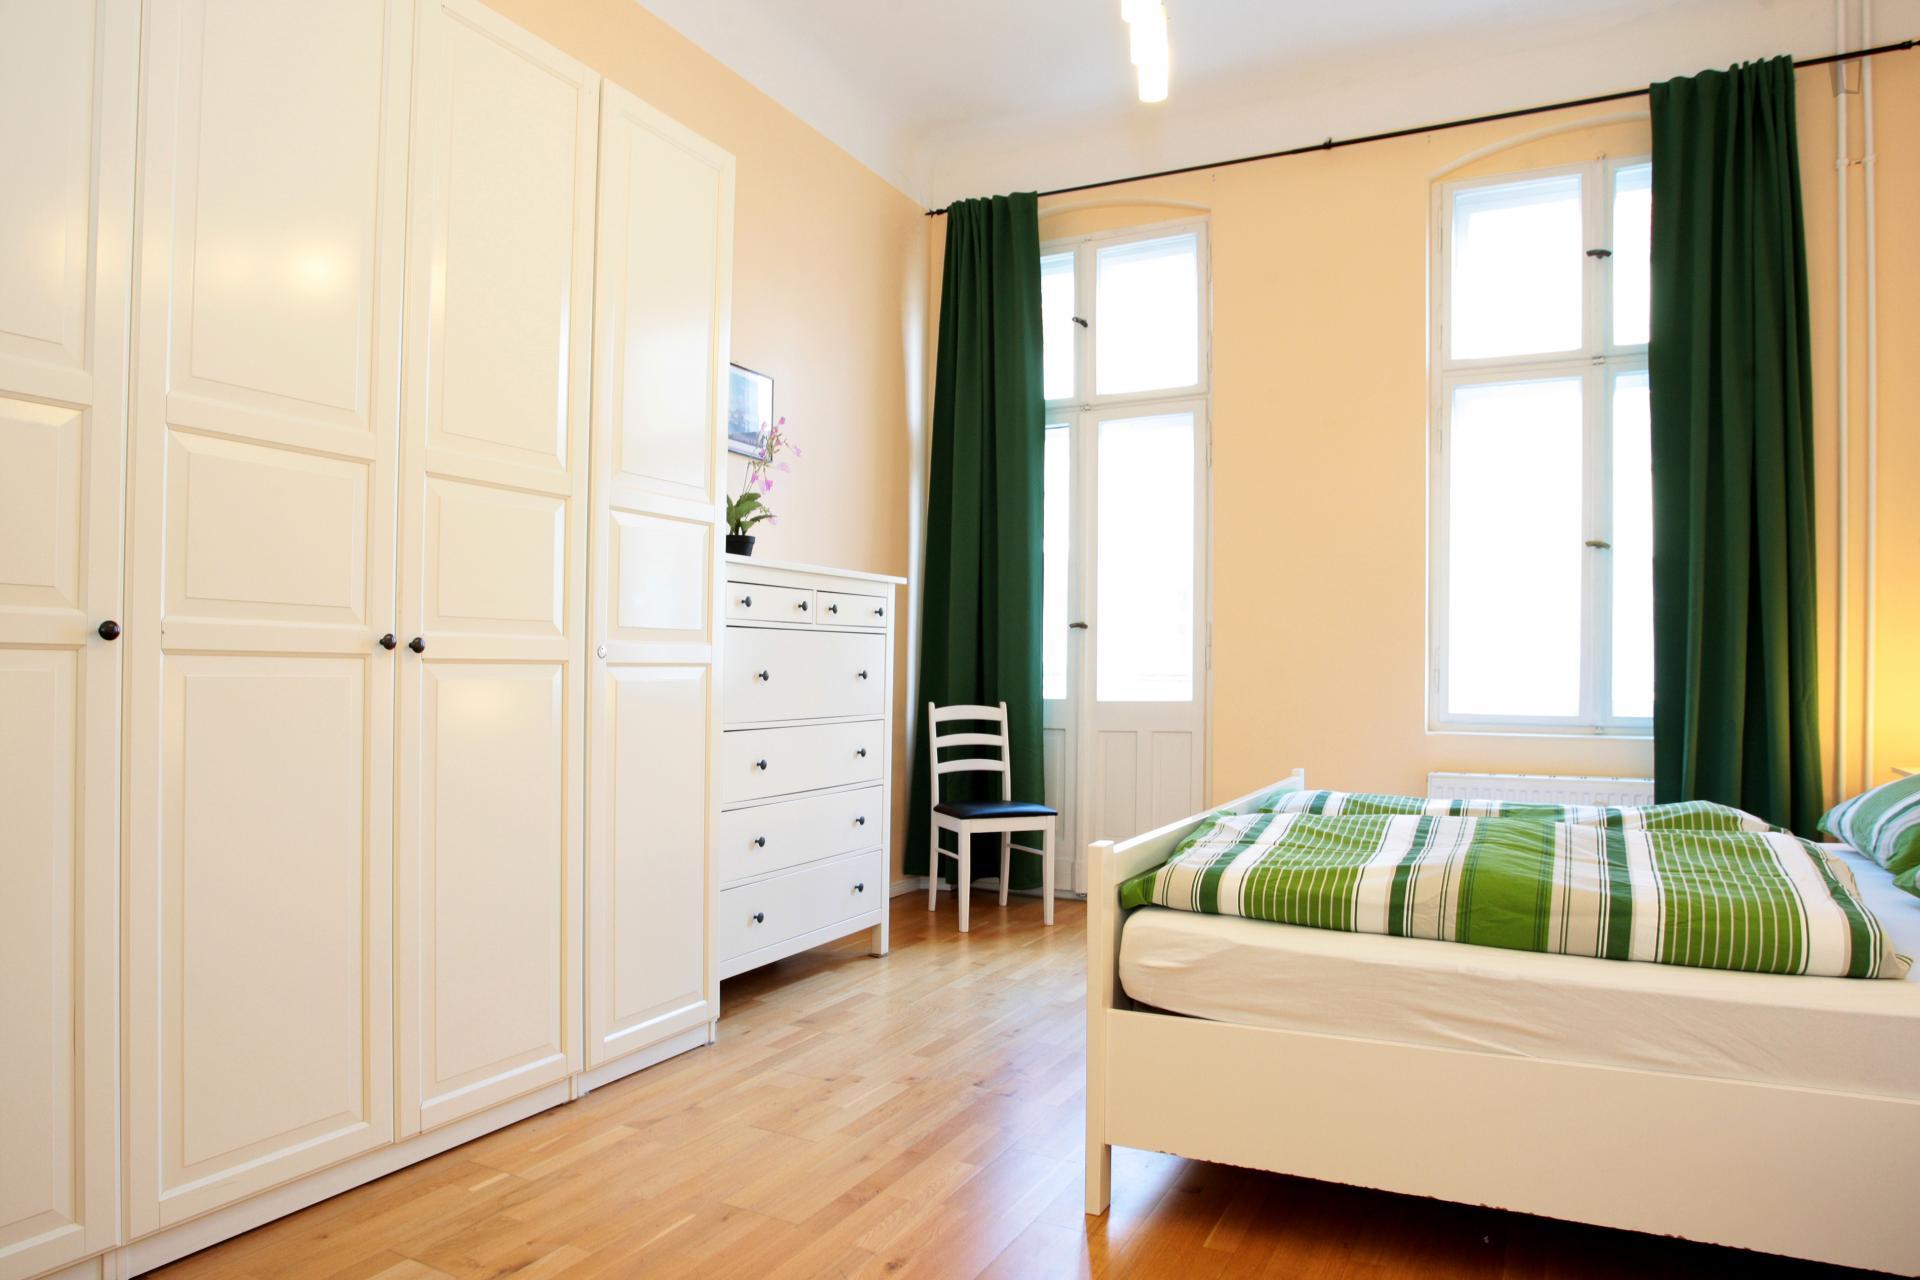 Emanuel - Expat flat with balcony in Berlin